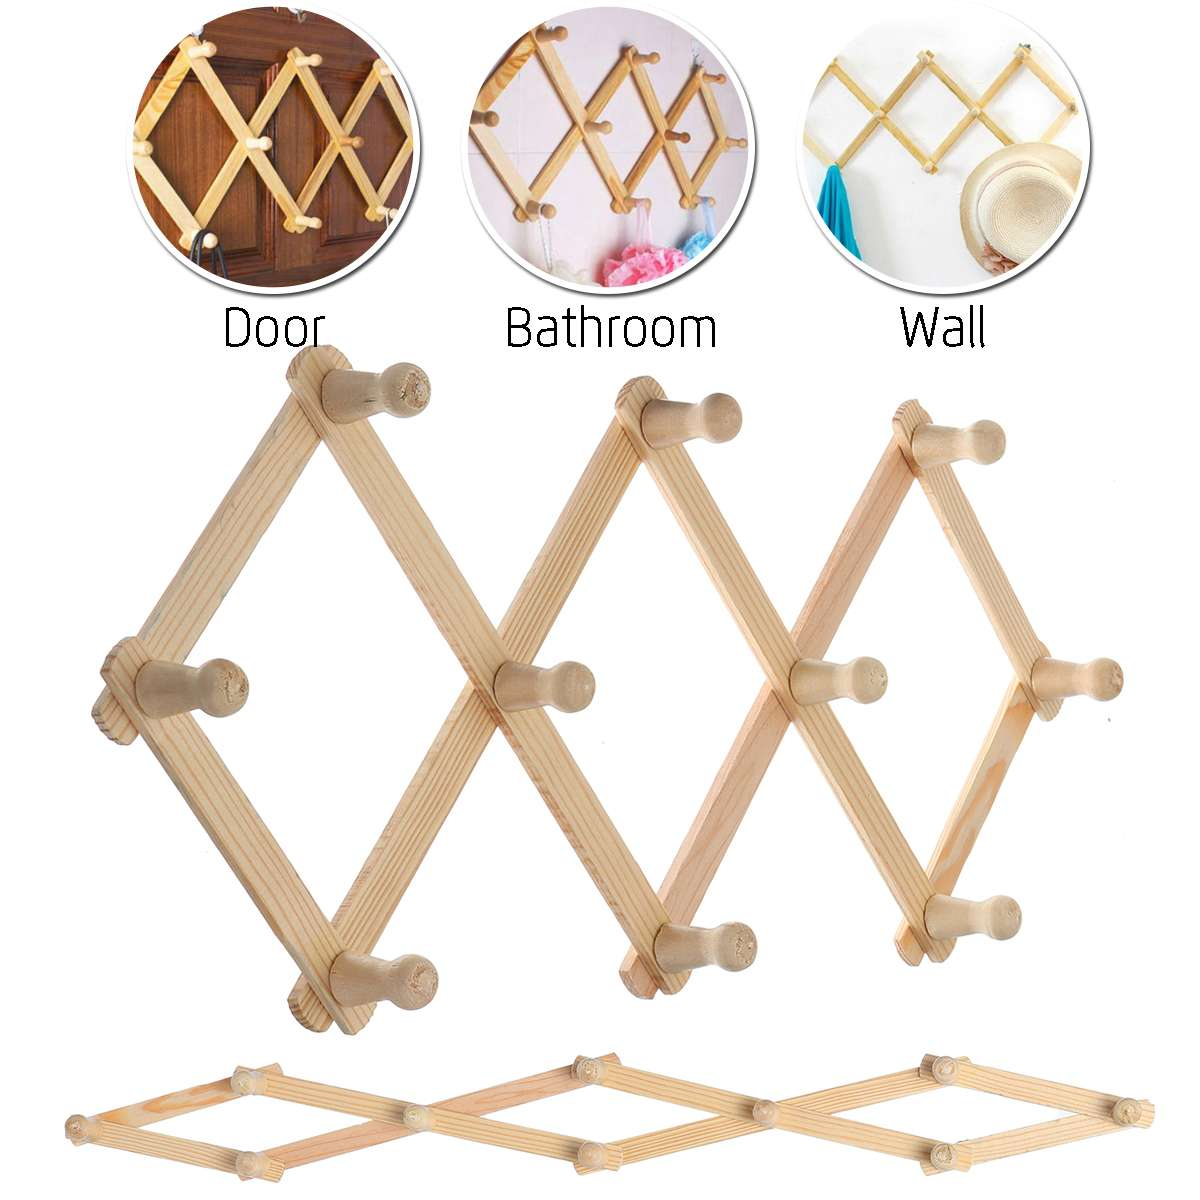 Wooden Simple Style Bedroom Furniture Wall Hanger Bamboo Coat Rack Clothes Hanging Hooks Living Room Coat Hanger Wall Hook